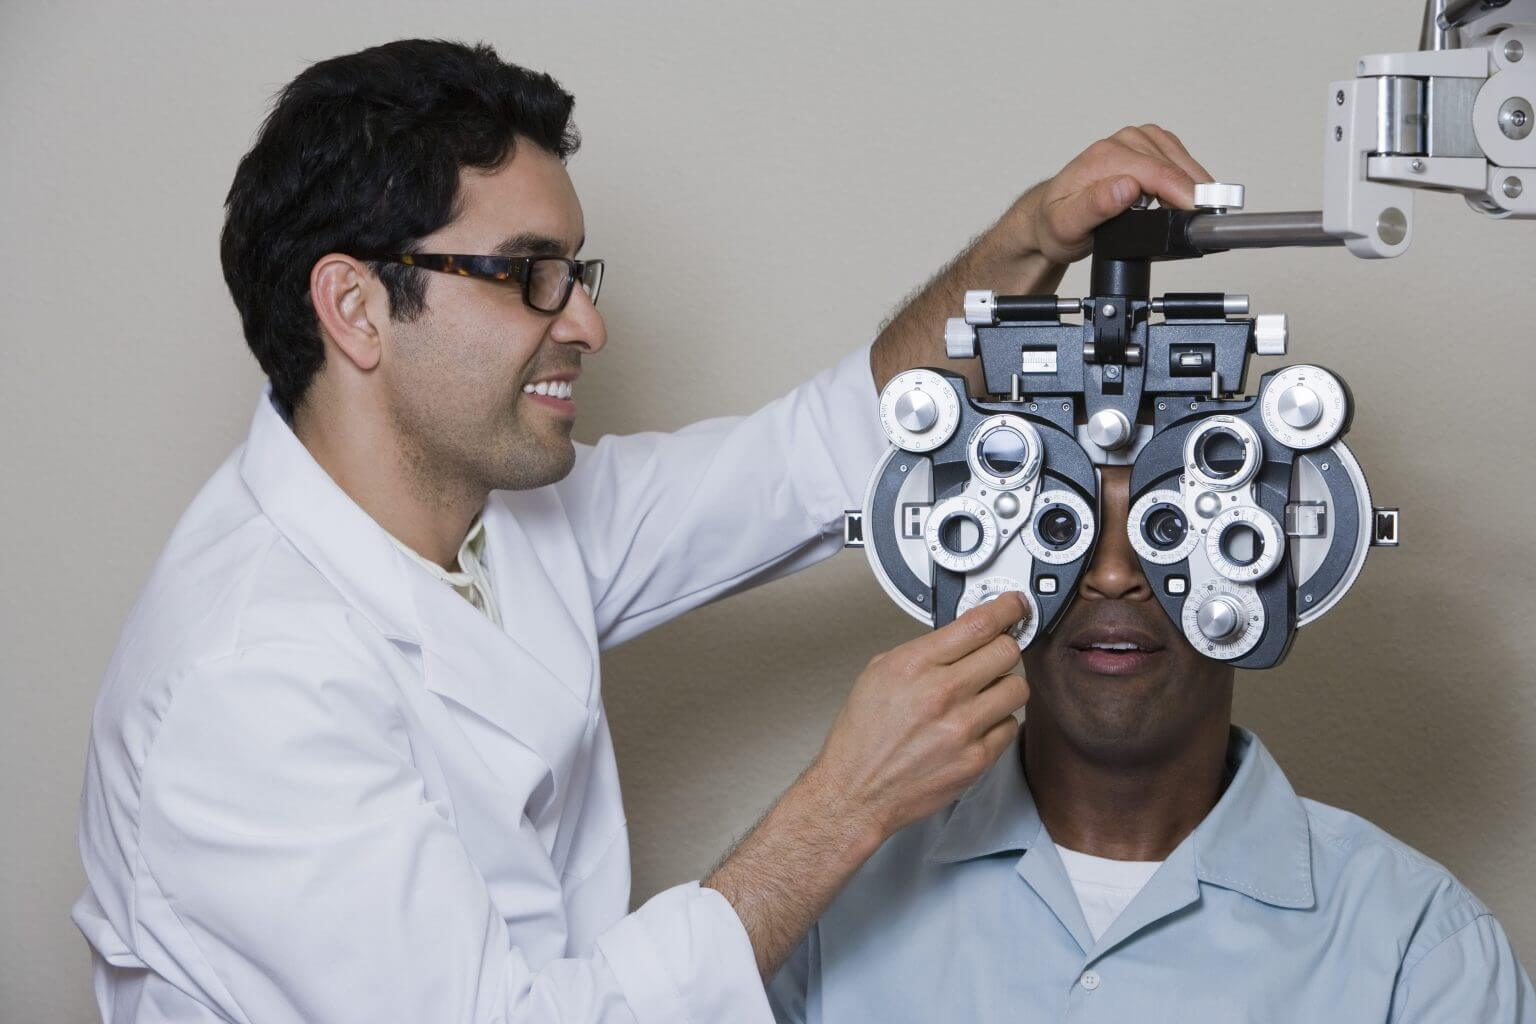 AMD Treatment - Low Vision Aids Blog